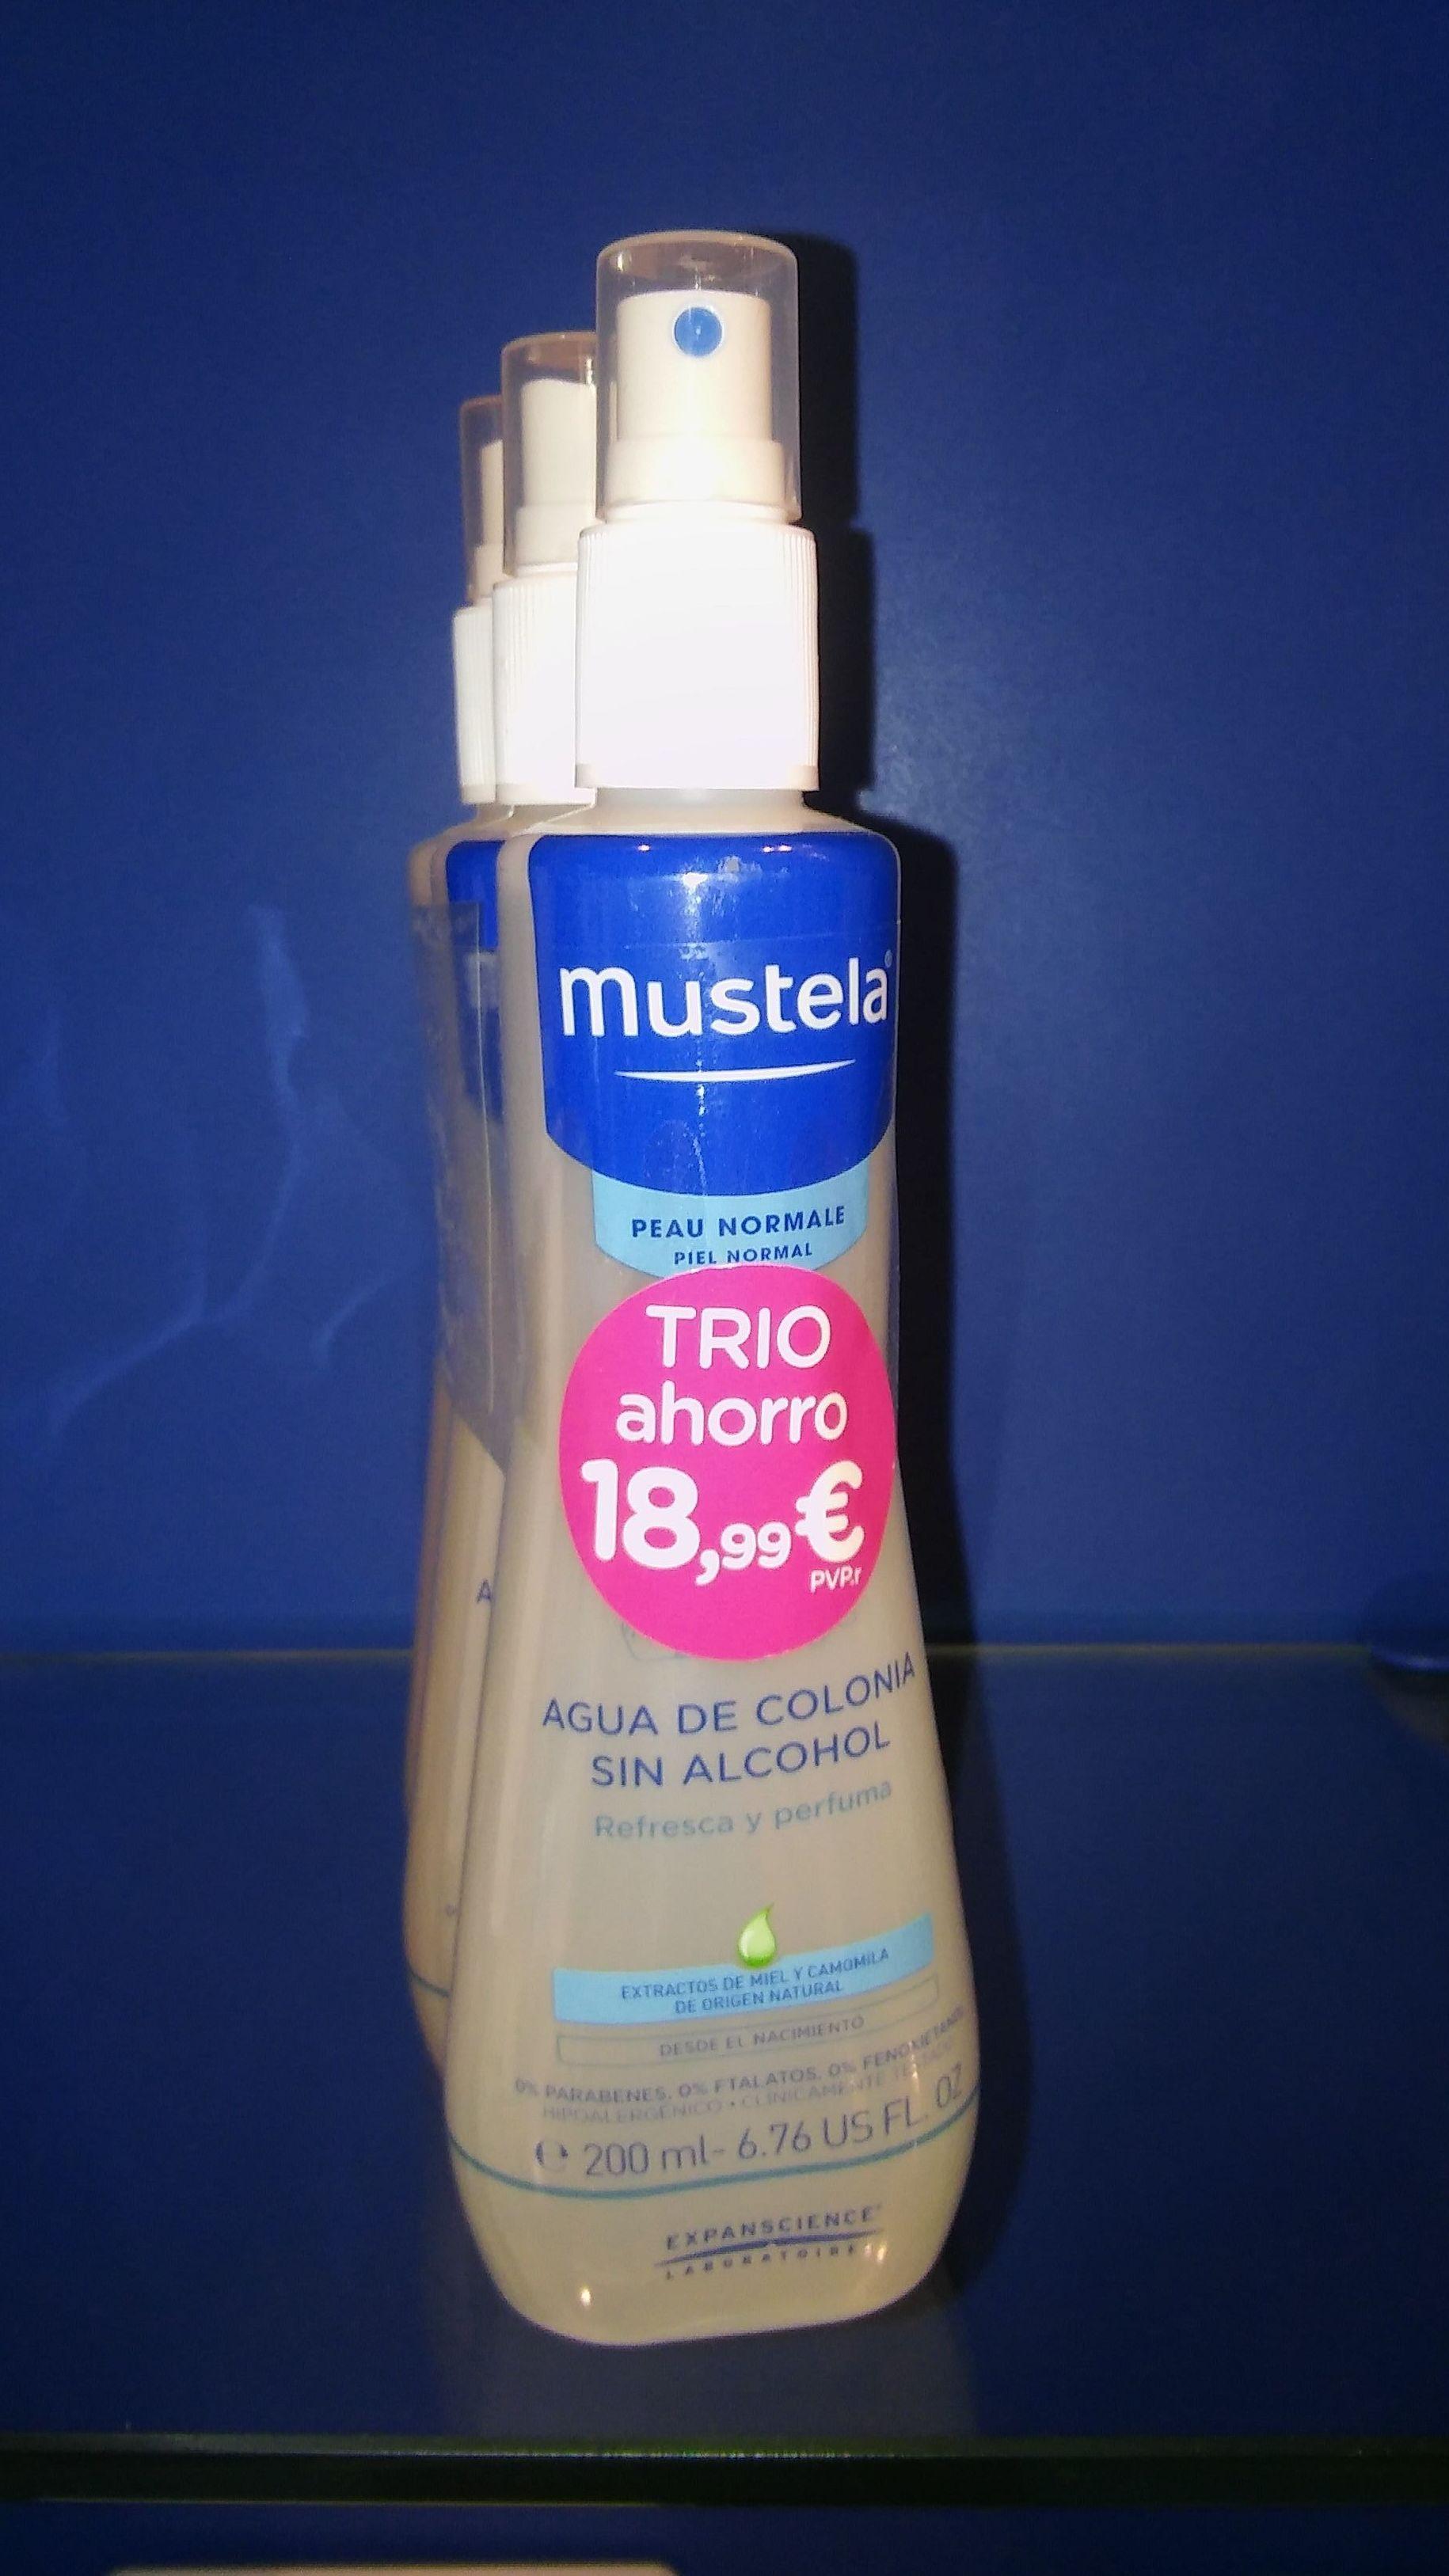 MUSTELA AGUA DE COLONIA PACK TRIO AHORRO 200MLX3 UD